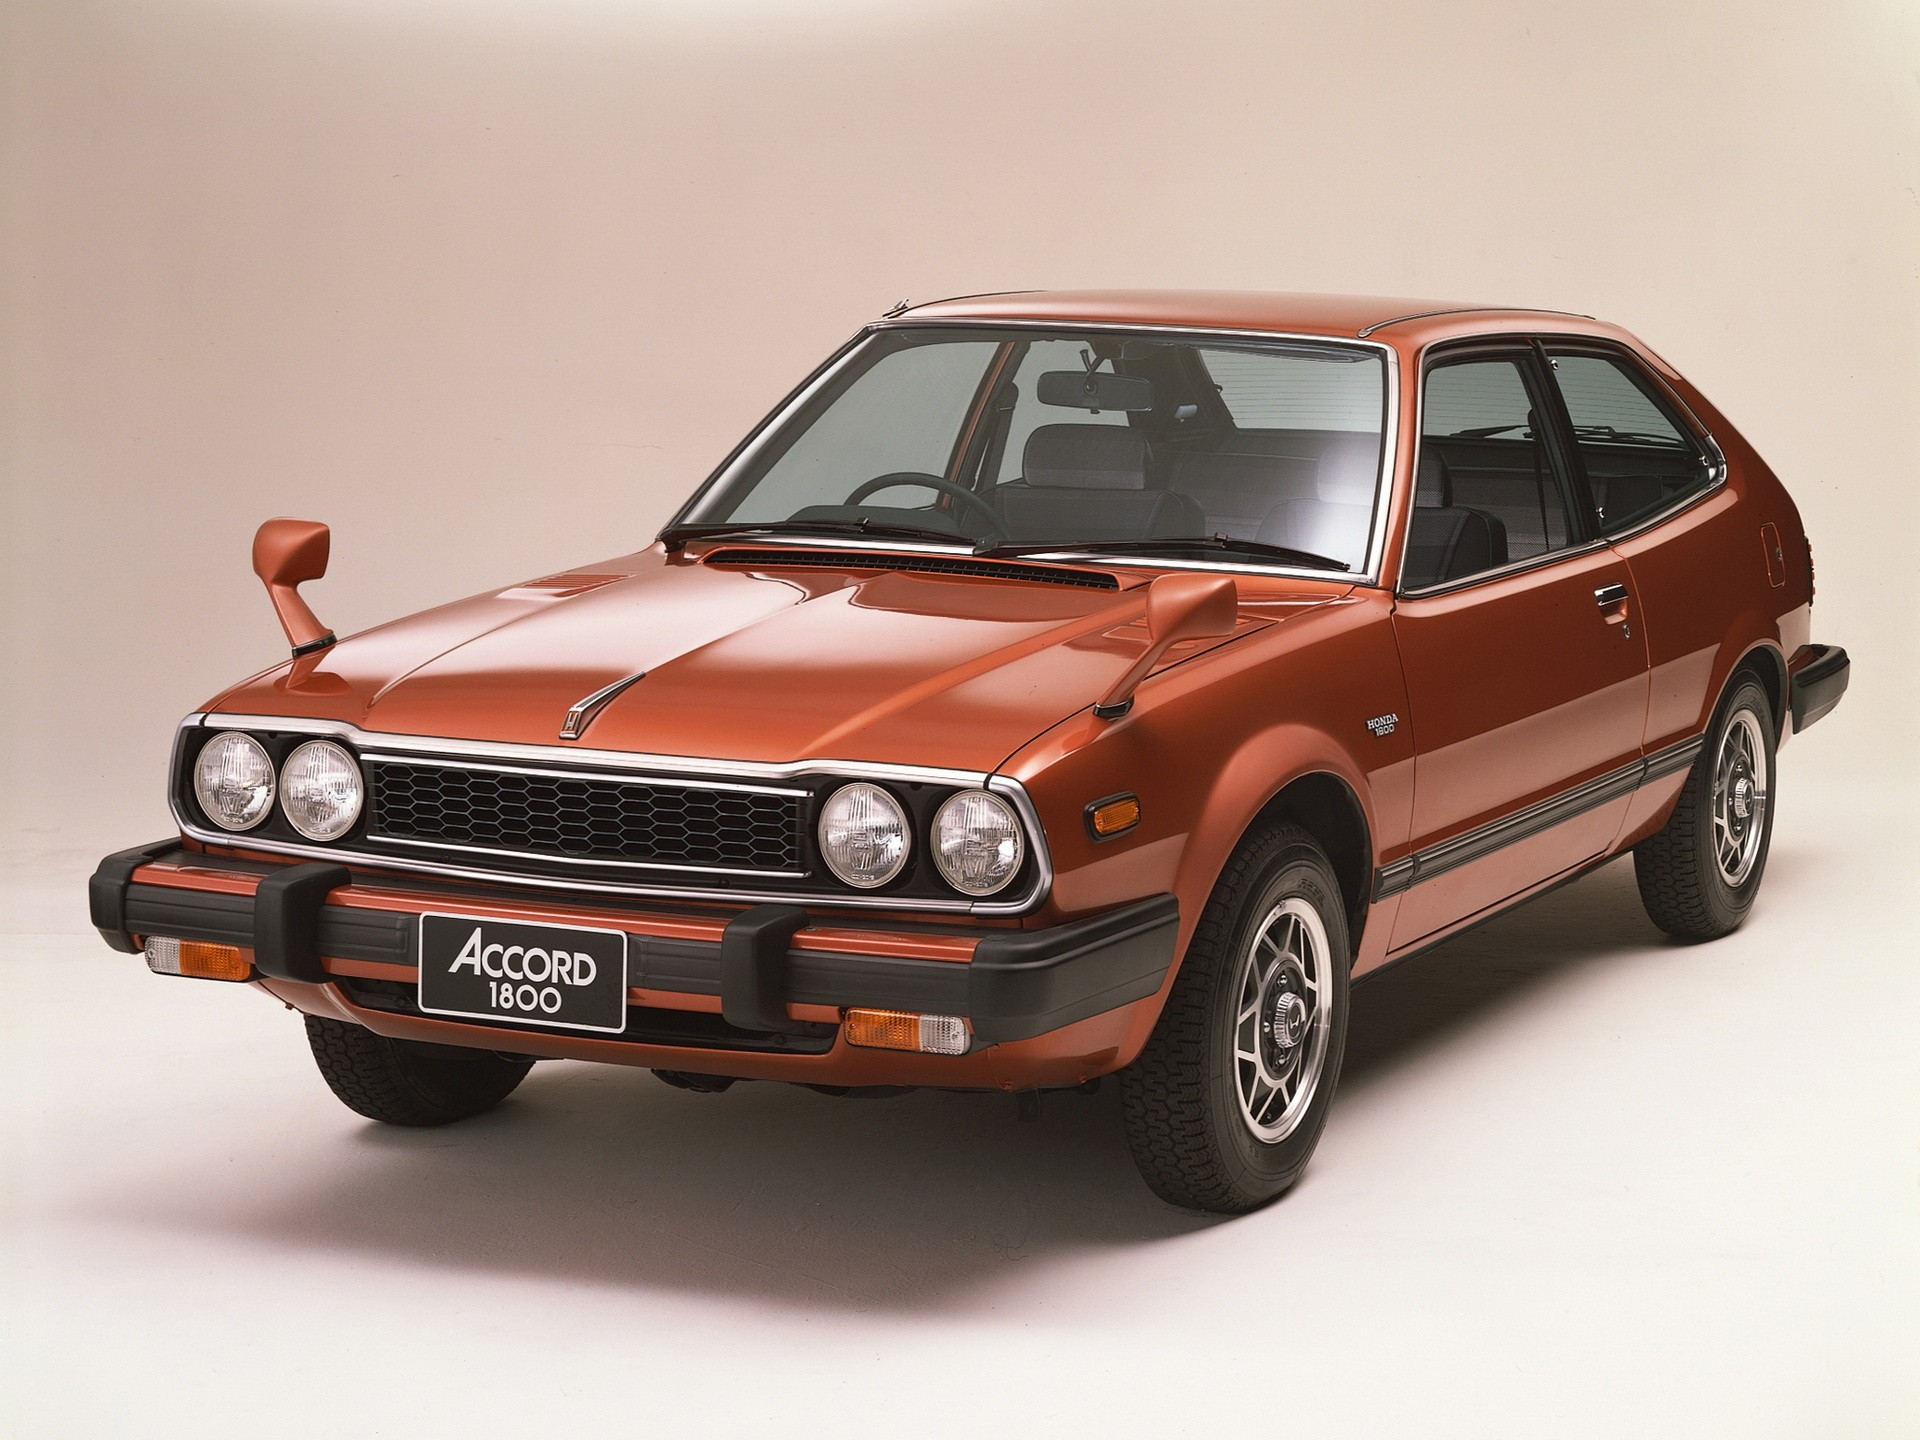 HONDA Accord 3 Doors - 1976, 1977, 1978, 1979, 1980, 1981 - autoevolution